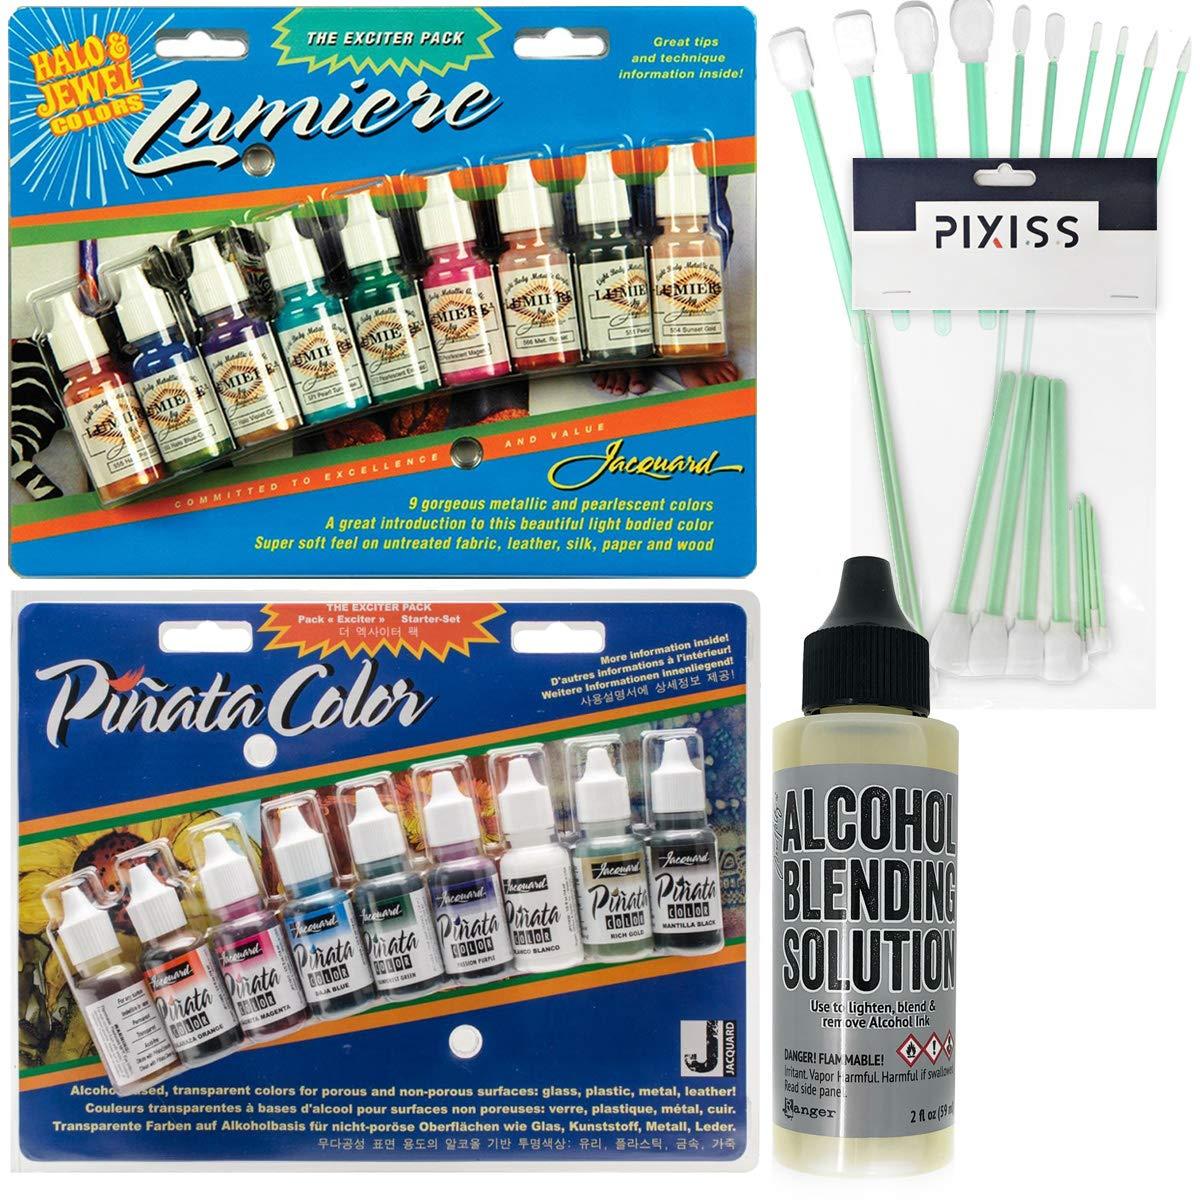 Jacquard Exciter Pack Bundle, Lumiere Exciter Pack .5oz 9/Pkg, Jacquard Pinata Color Exciter Pack Alcohol Ink, Ranger Alcohol Blending Solution, 10x Pixiss Blending Tools